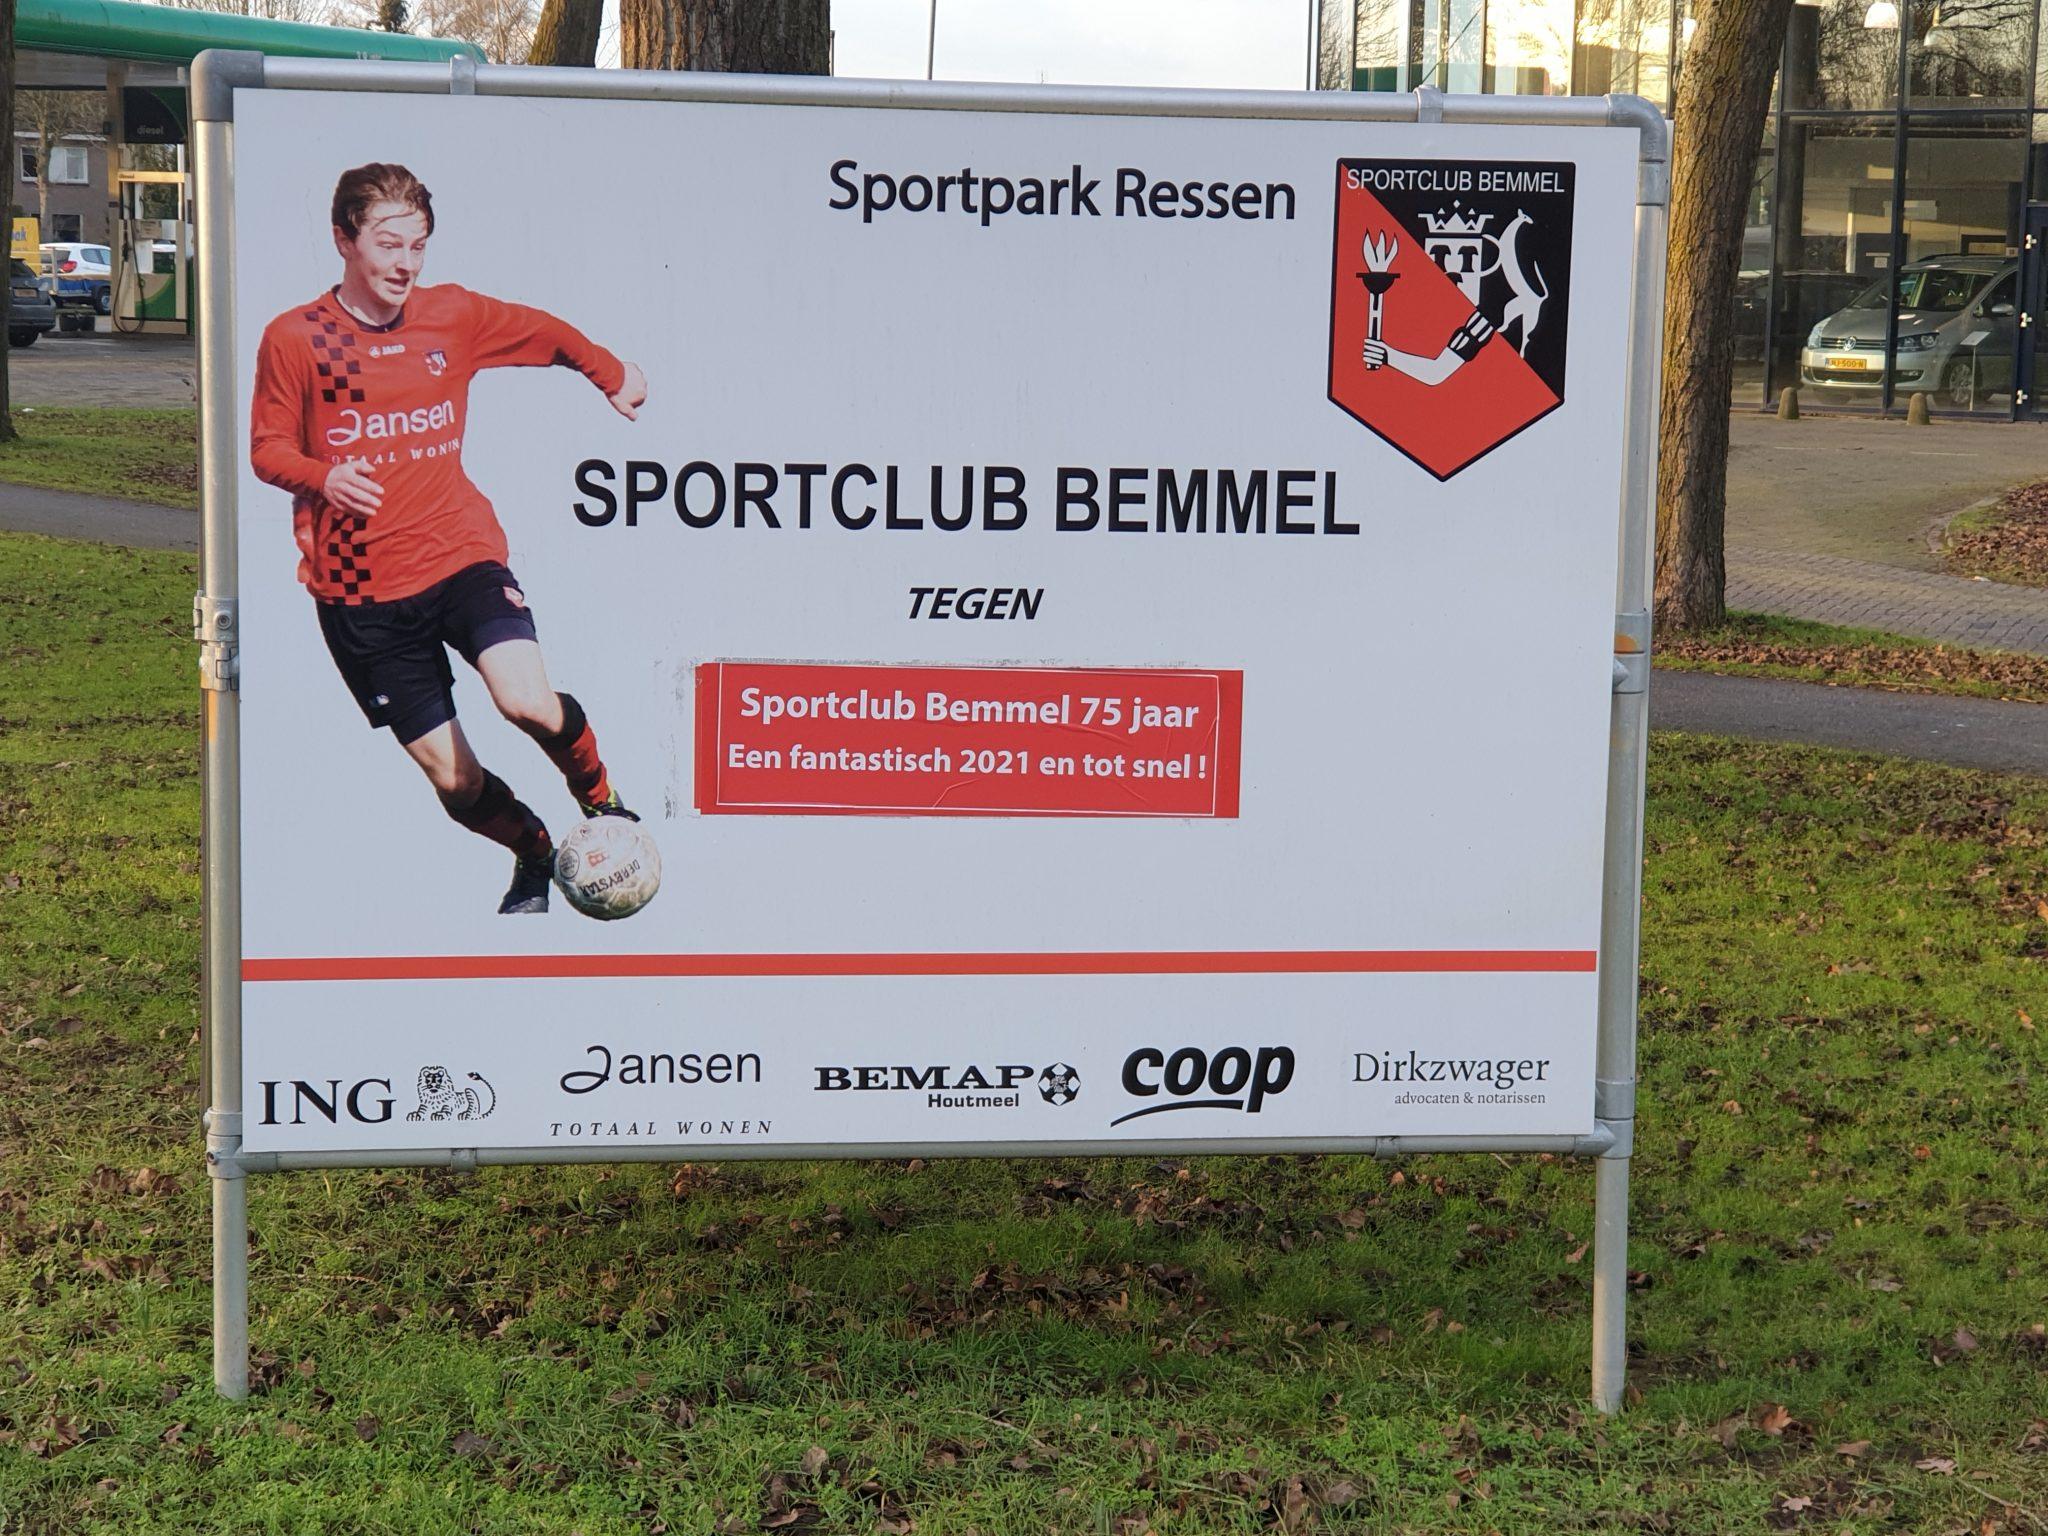 Sportclub Bemmel 75 jaar